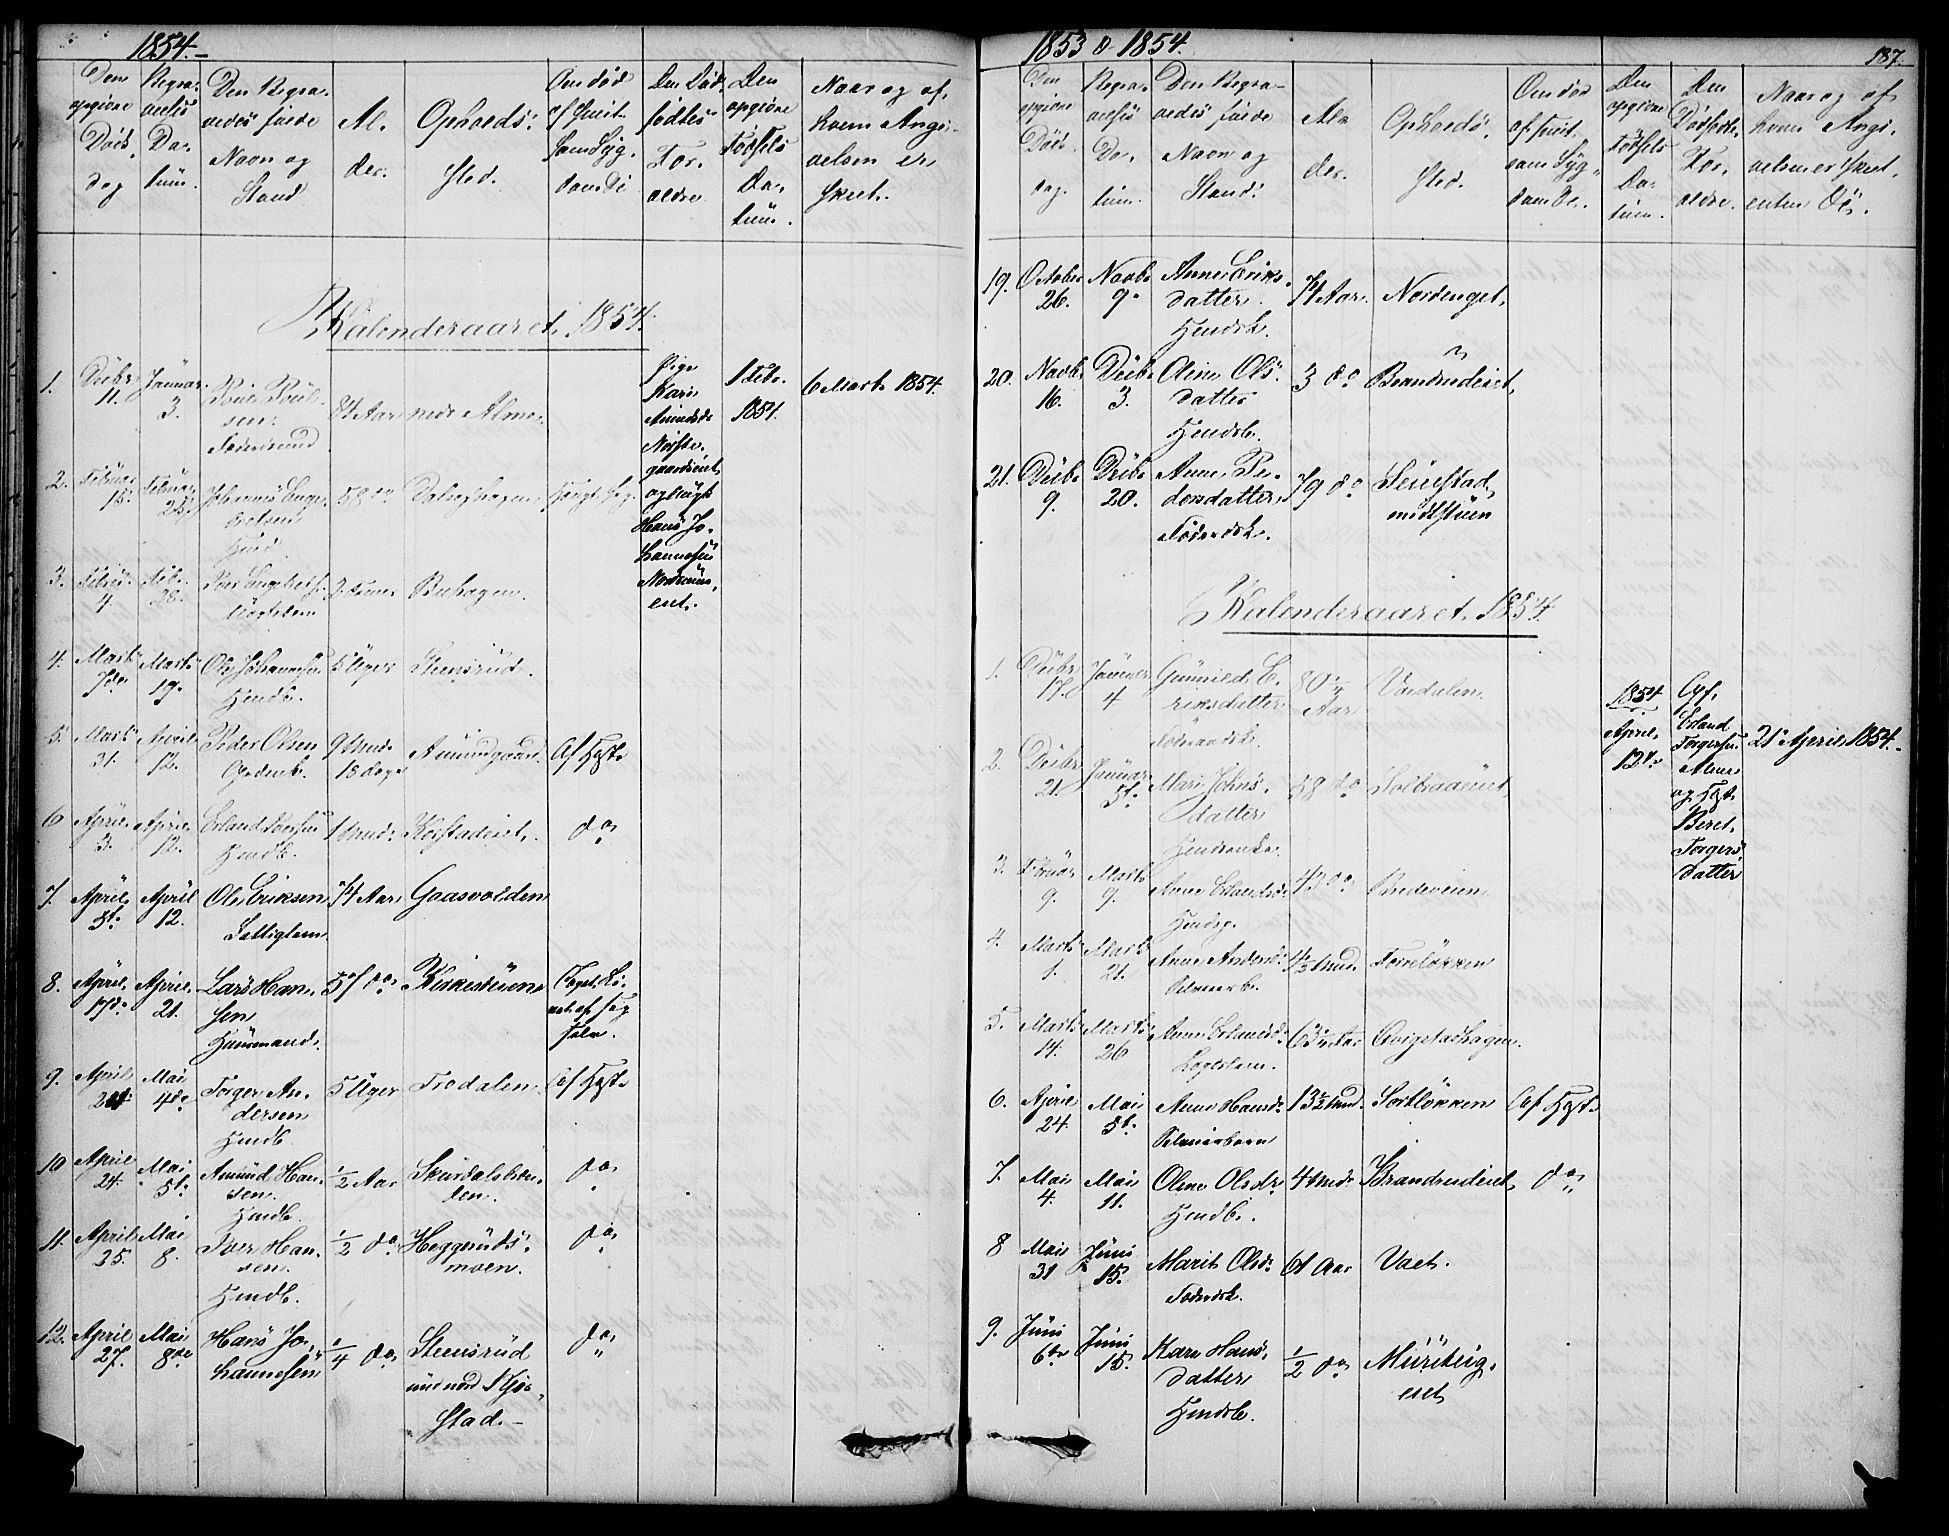 SAH, Sør-Fron prestekontor, H/Ha/Hab/L0001: Klokkerbok nr. 1, 1844-1863, s. 187